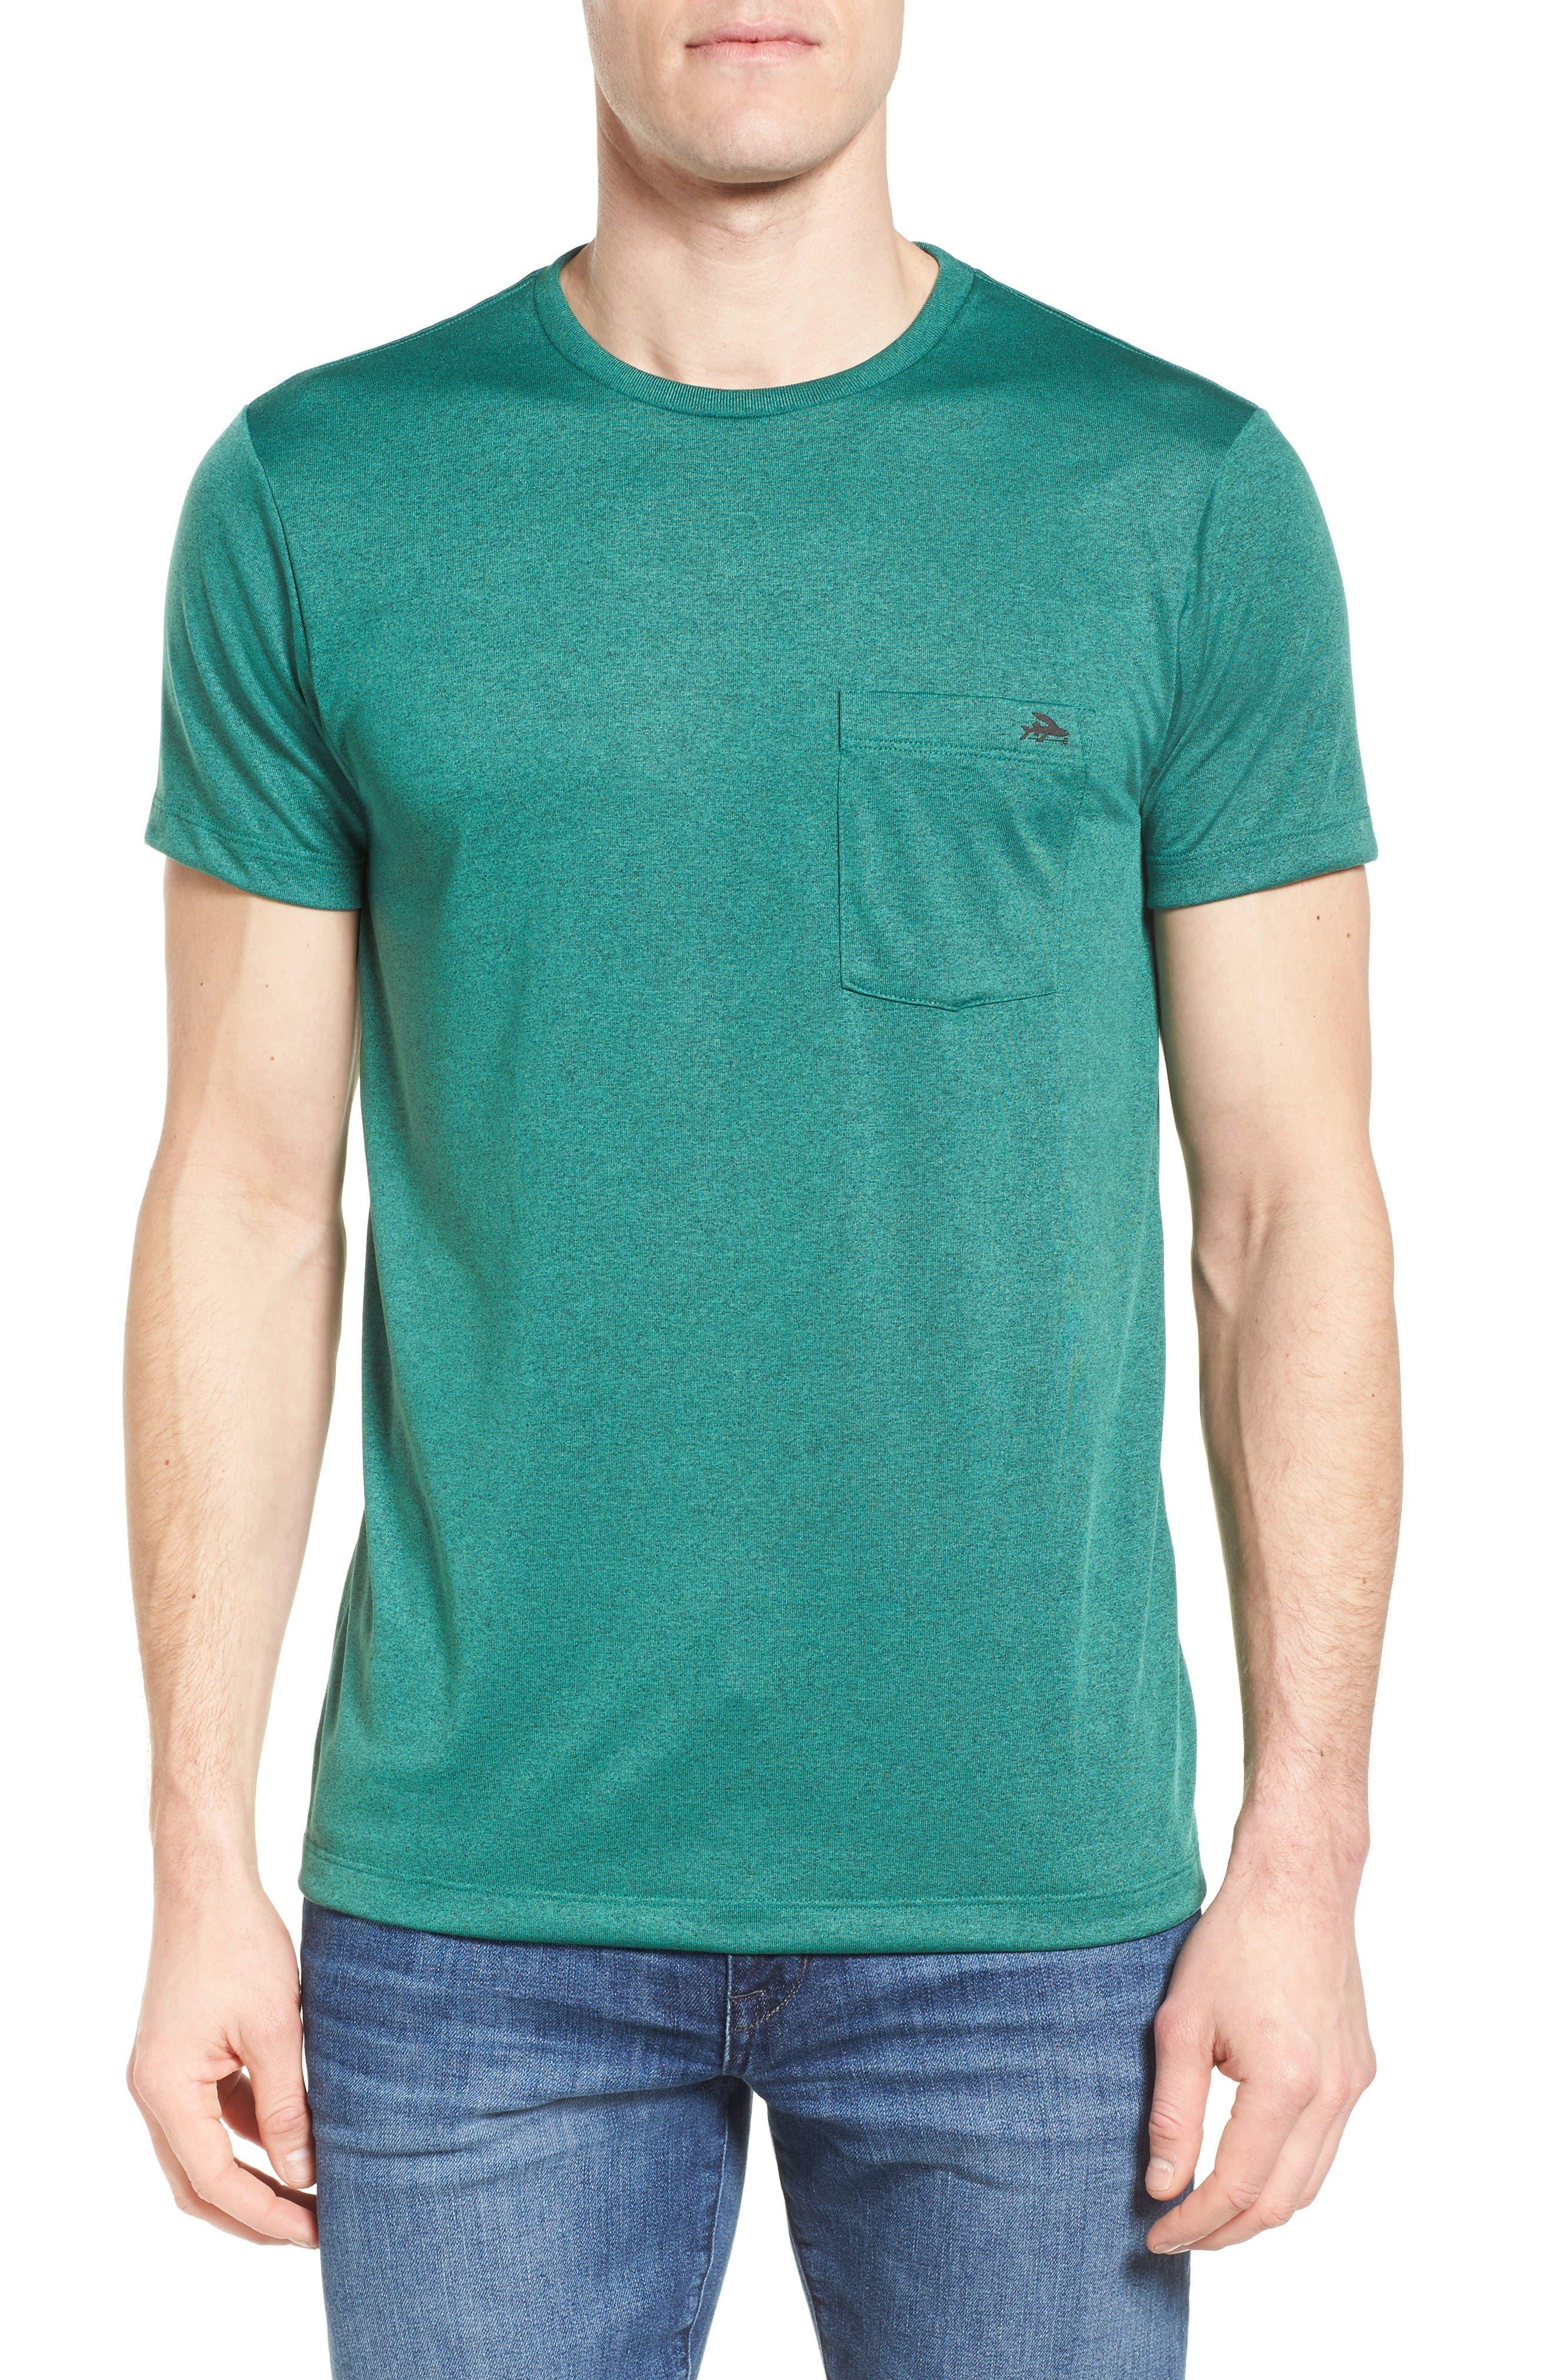 Patagonia Flying Fish Responsibili-Tee® Slim Fit T-Shirt